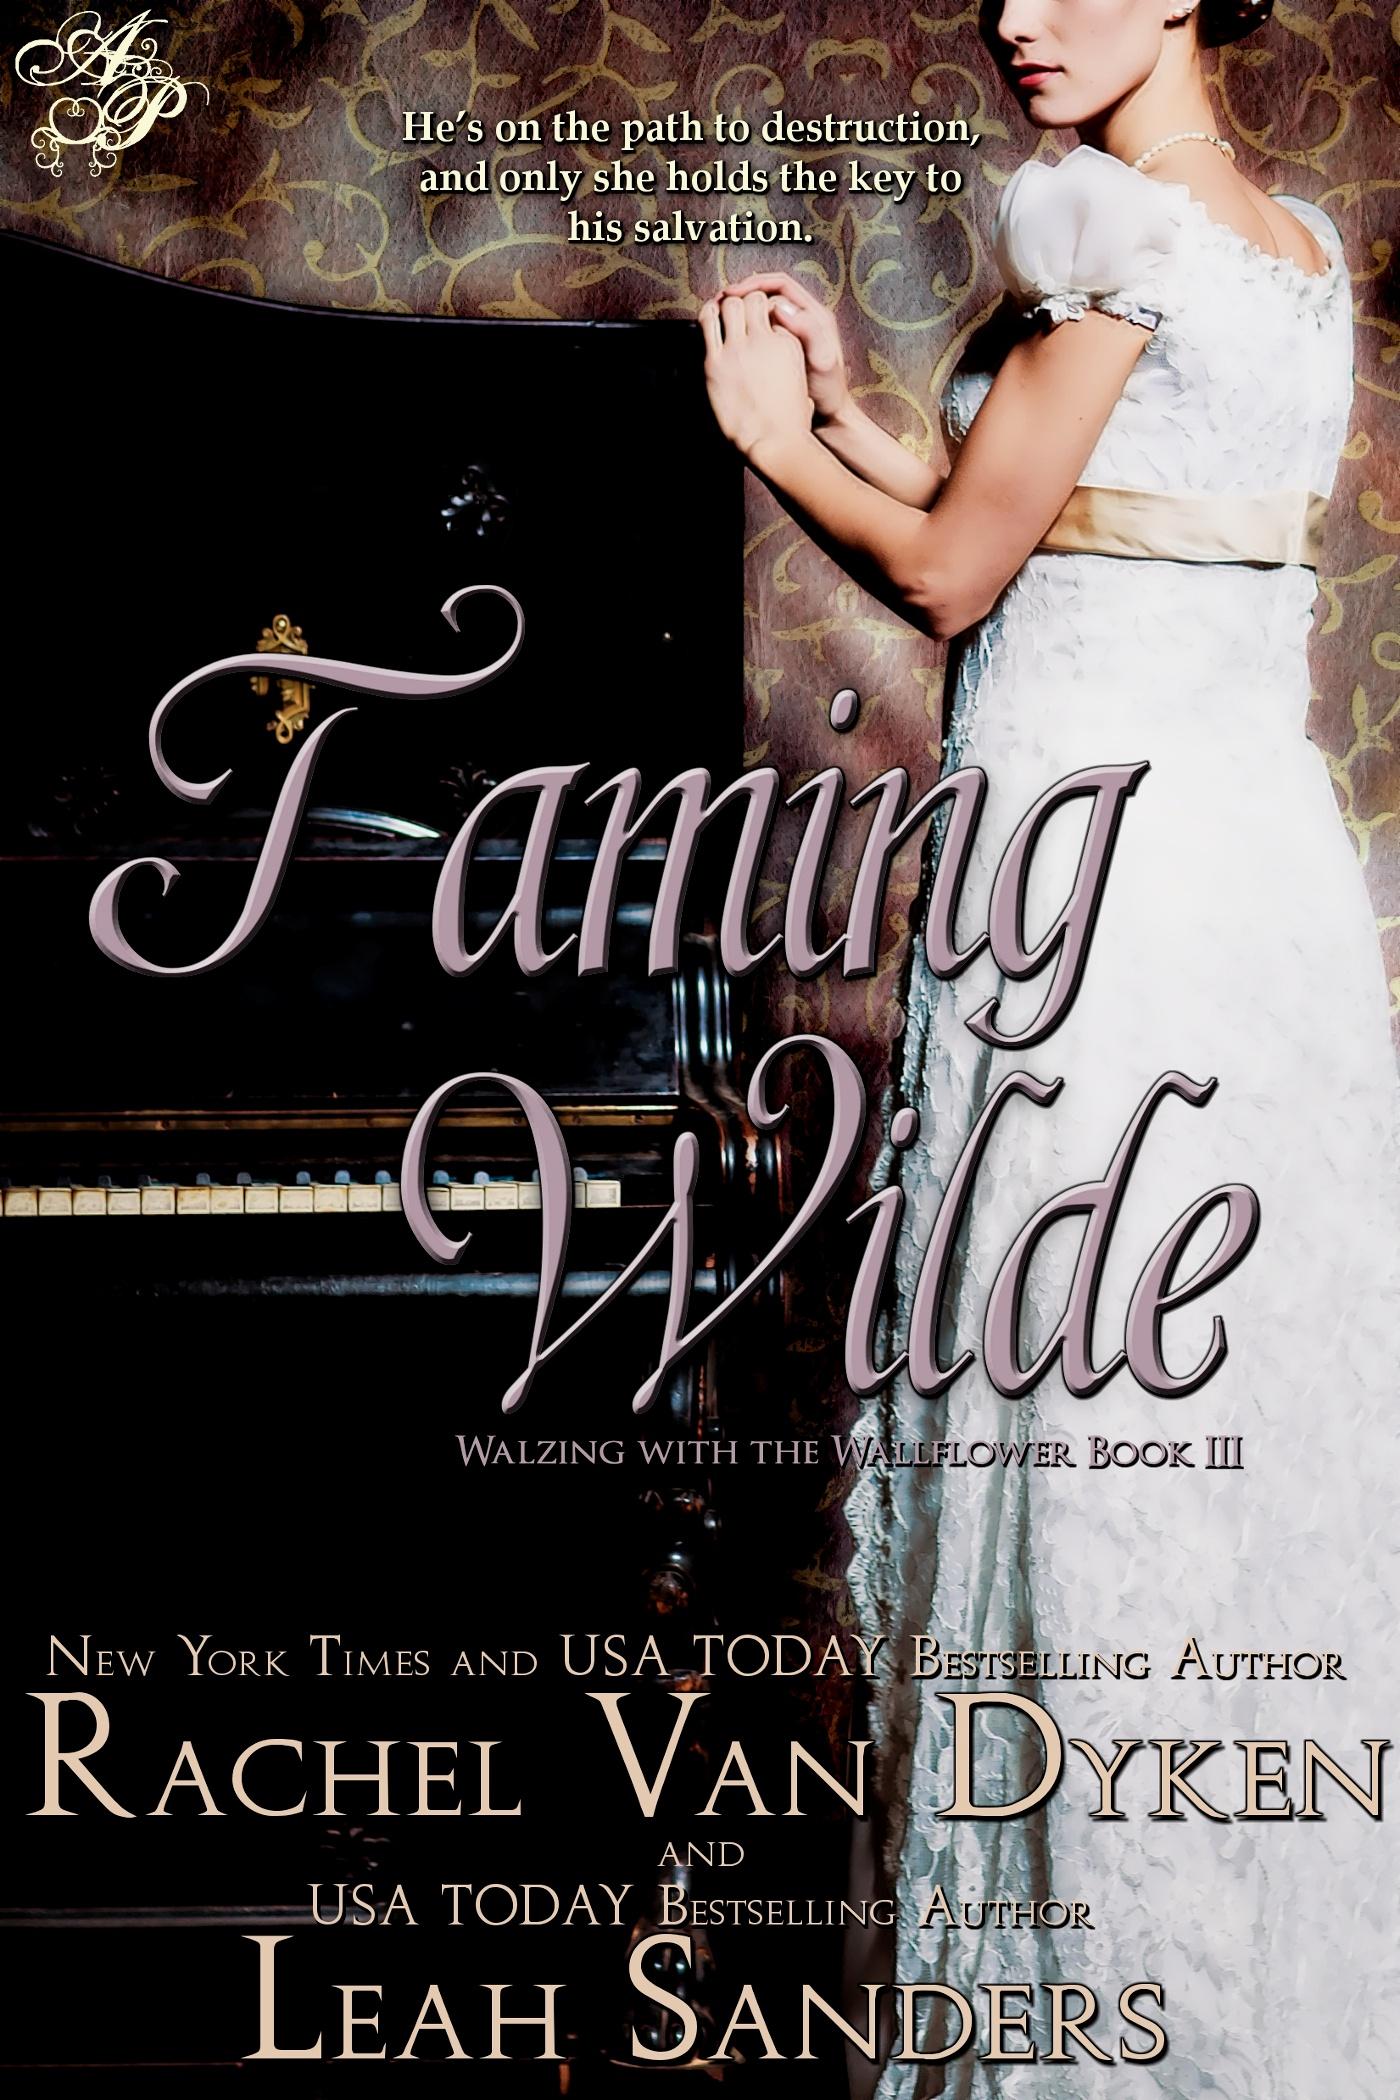 Rachel Van Dyken - Taming Wilde by Rachel Van Dyken and Leah Sanders